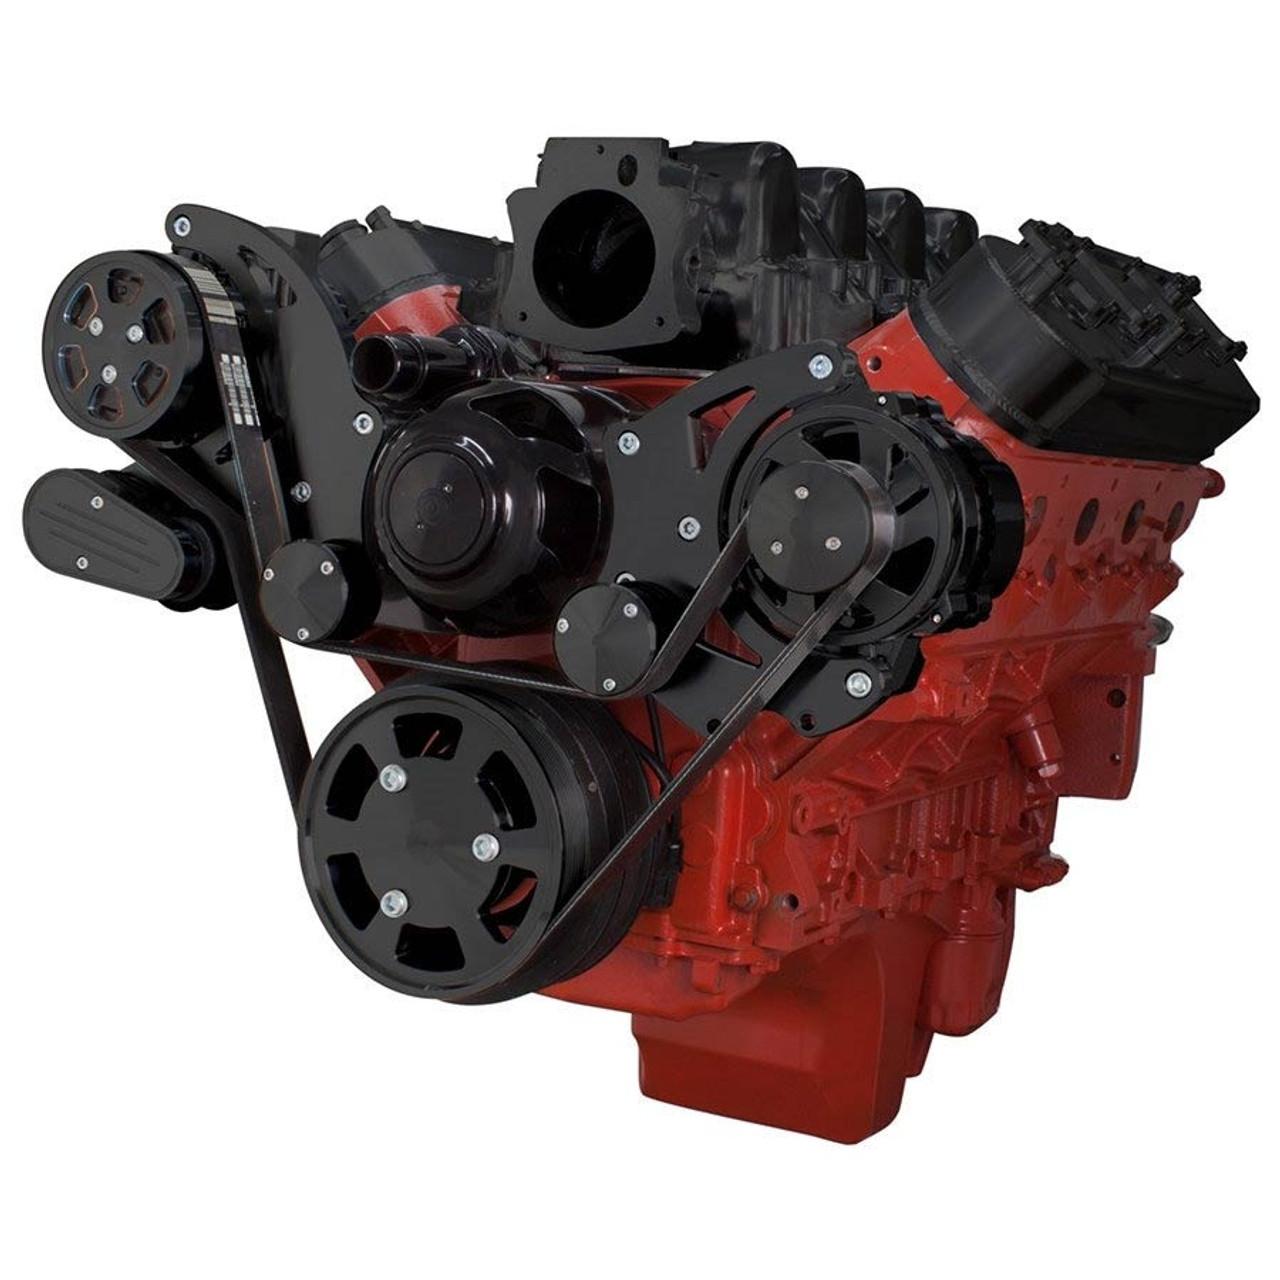 Stealth Black Chevy LS High Mount Serpentine Kit - AC & Power Steering,  Electric Water Pump